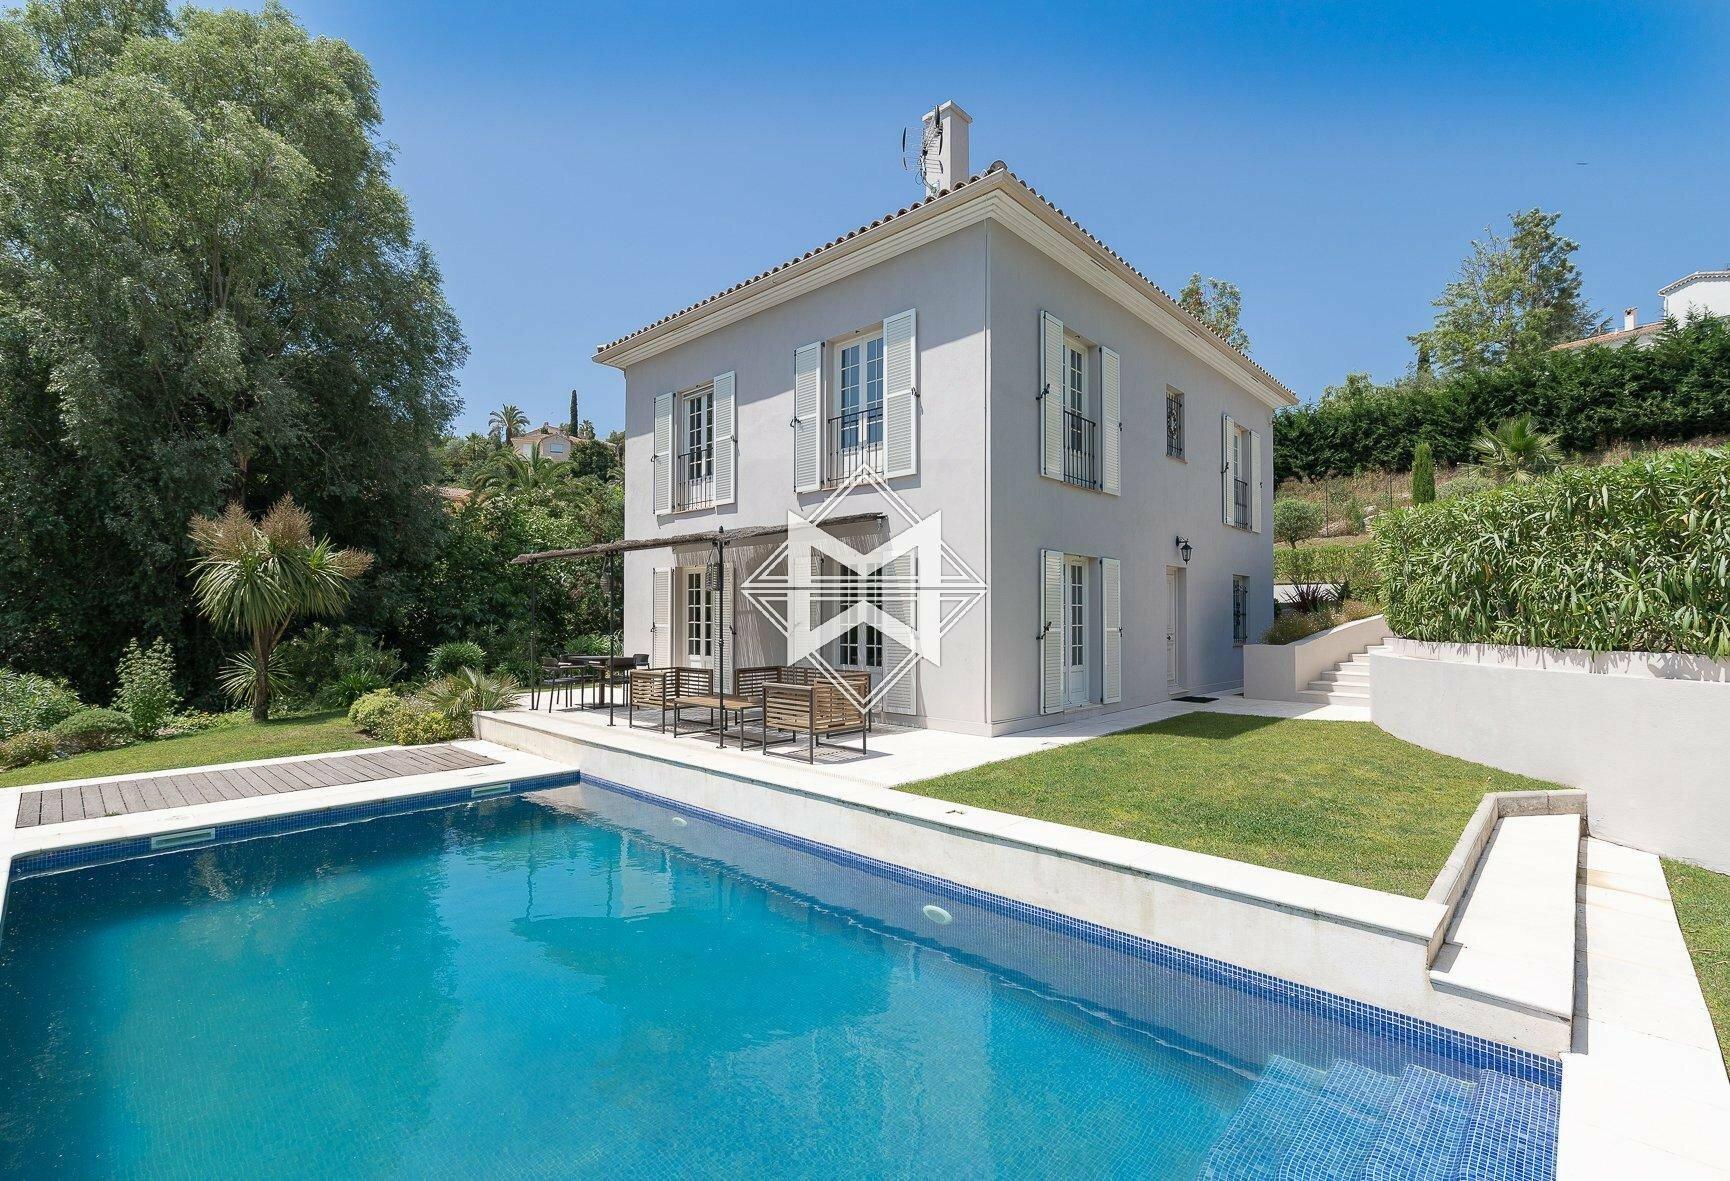 Villa in Vallauris, Provence-Alpes-Côte d'Azur, France 1 - 11527105